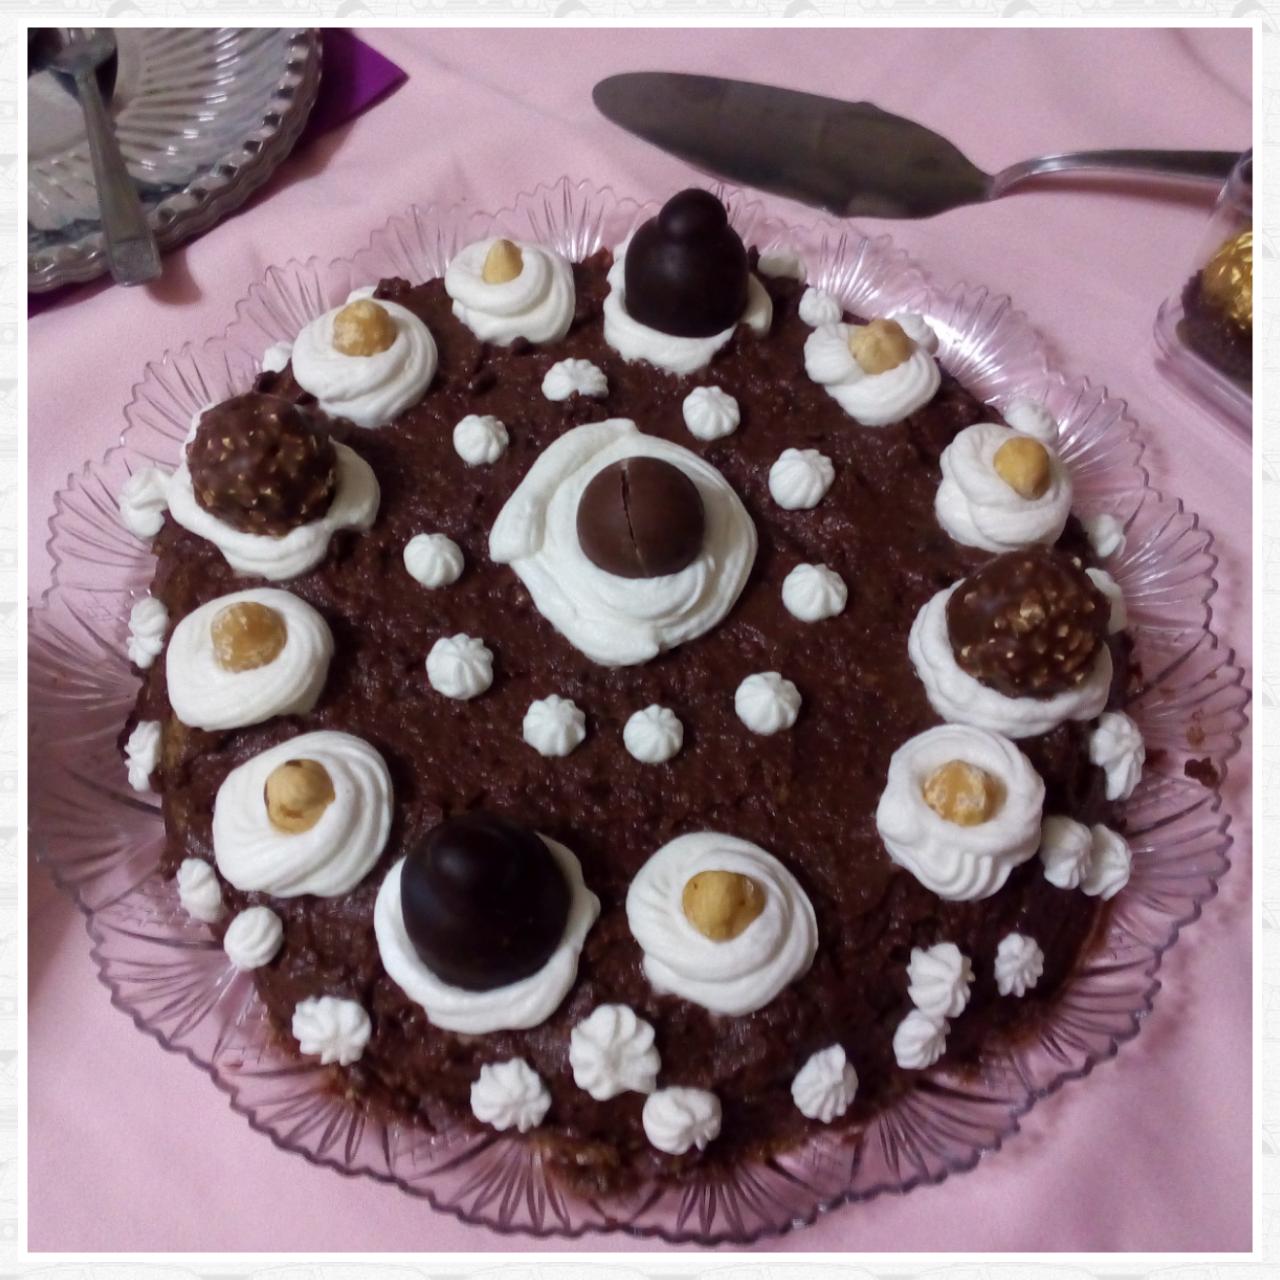 Torta pandoro con crema cioccolato e wafer